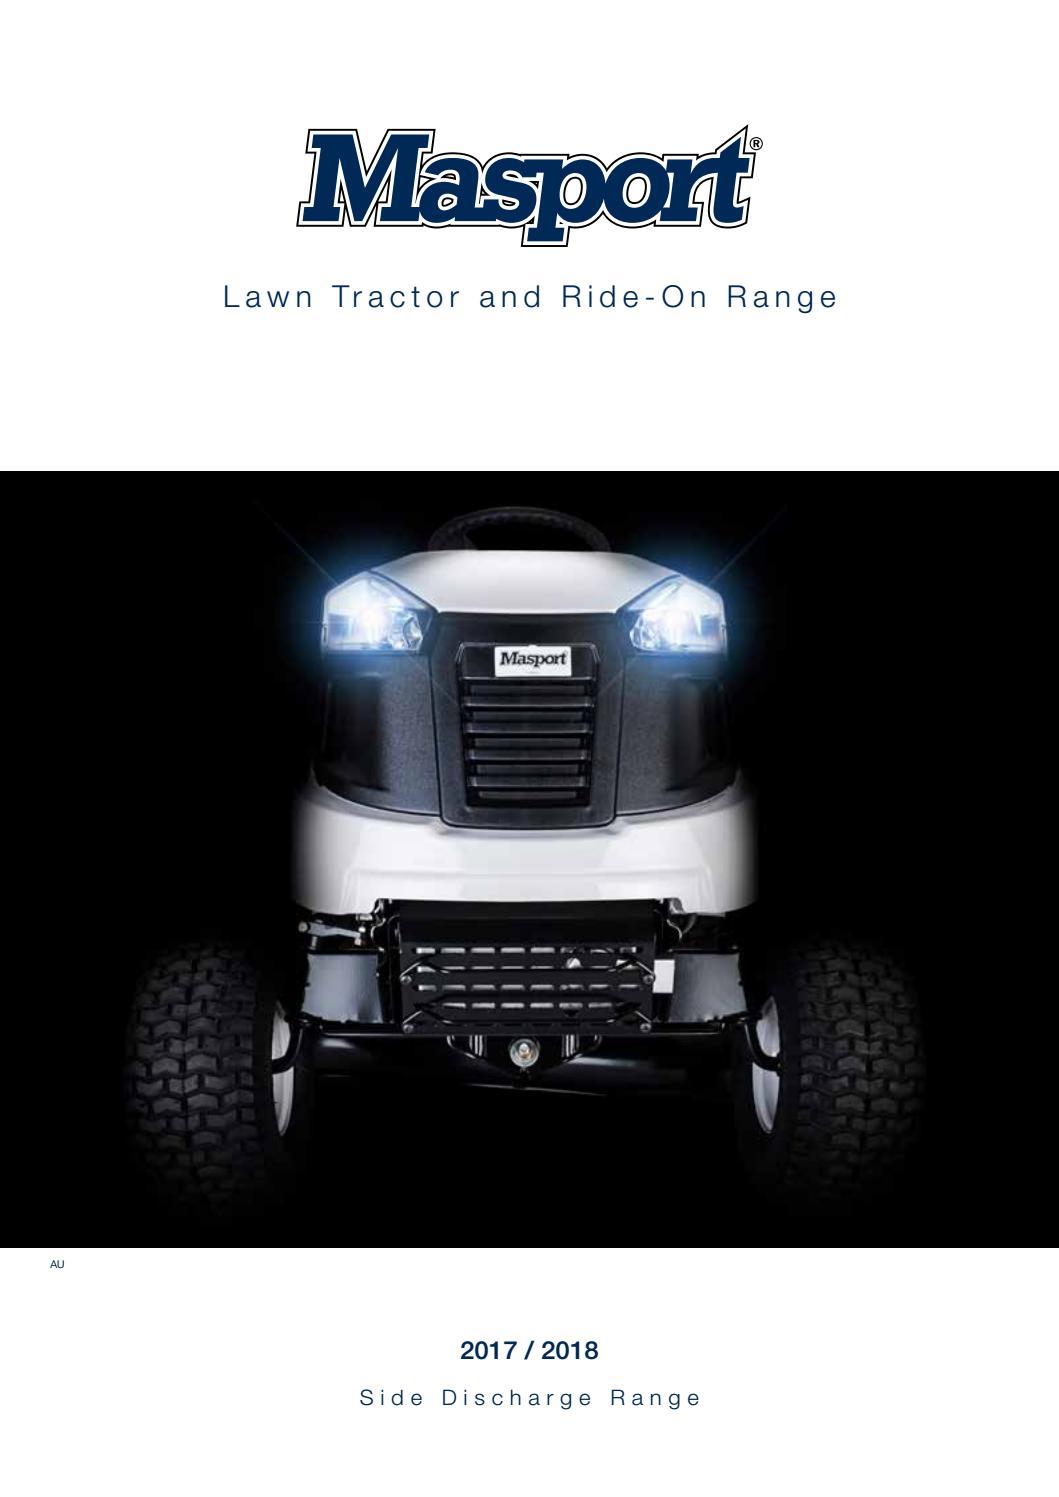 Masport Lawn Tractor and Ride-On Range SDR AU 2017-2018 by Bridge